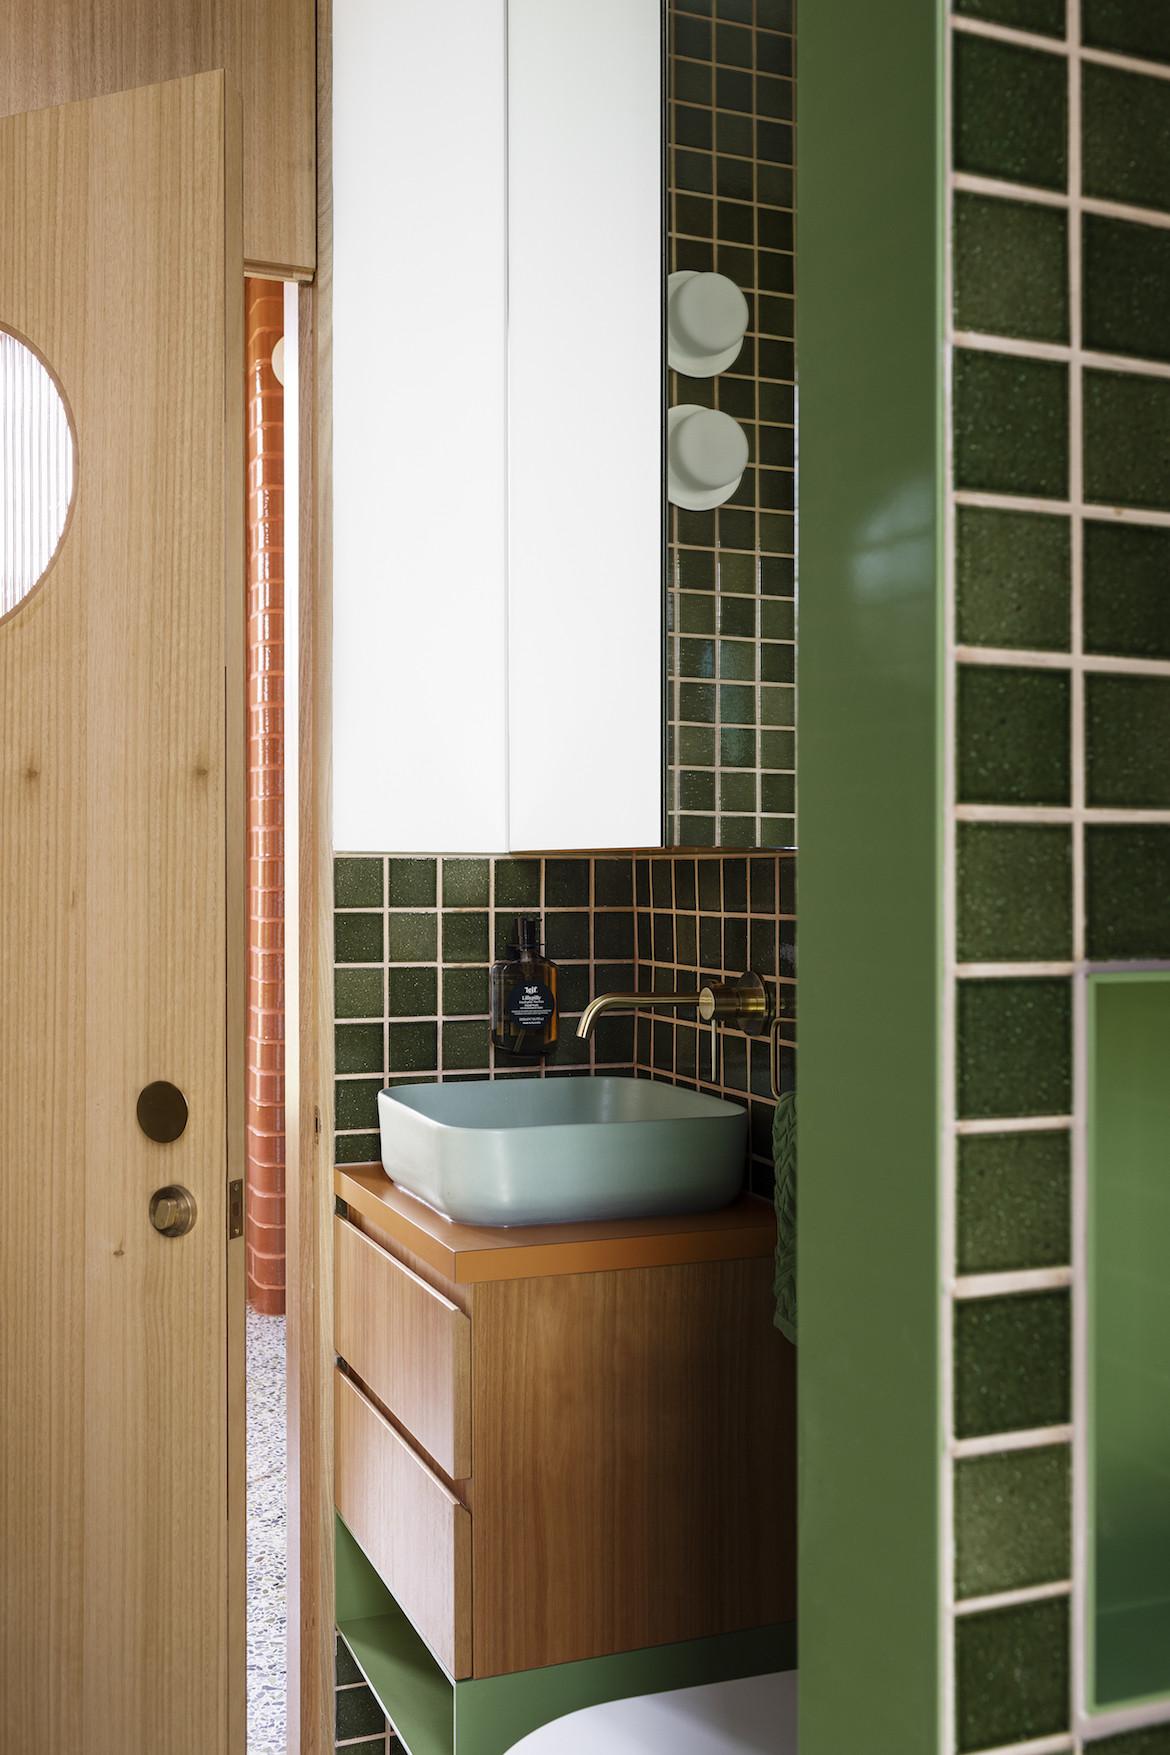 Green tiled bathroom.